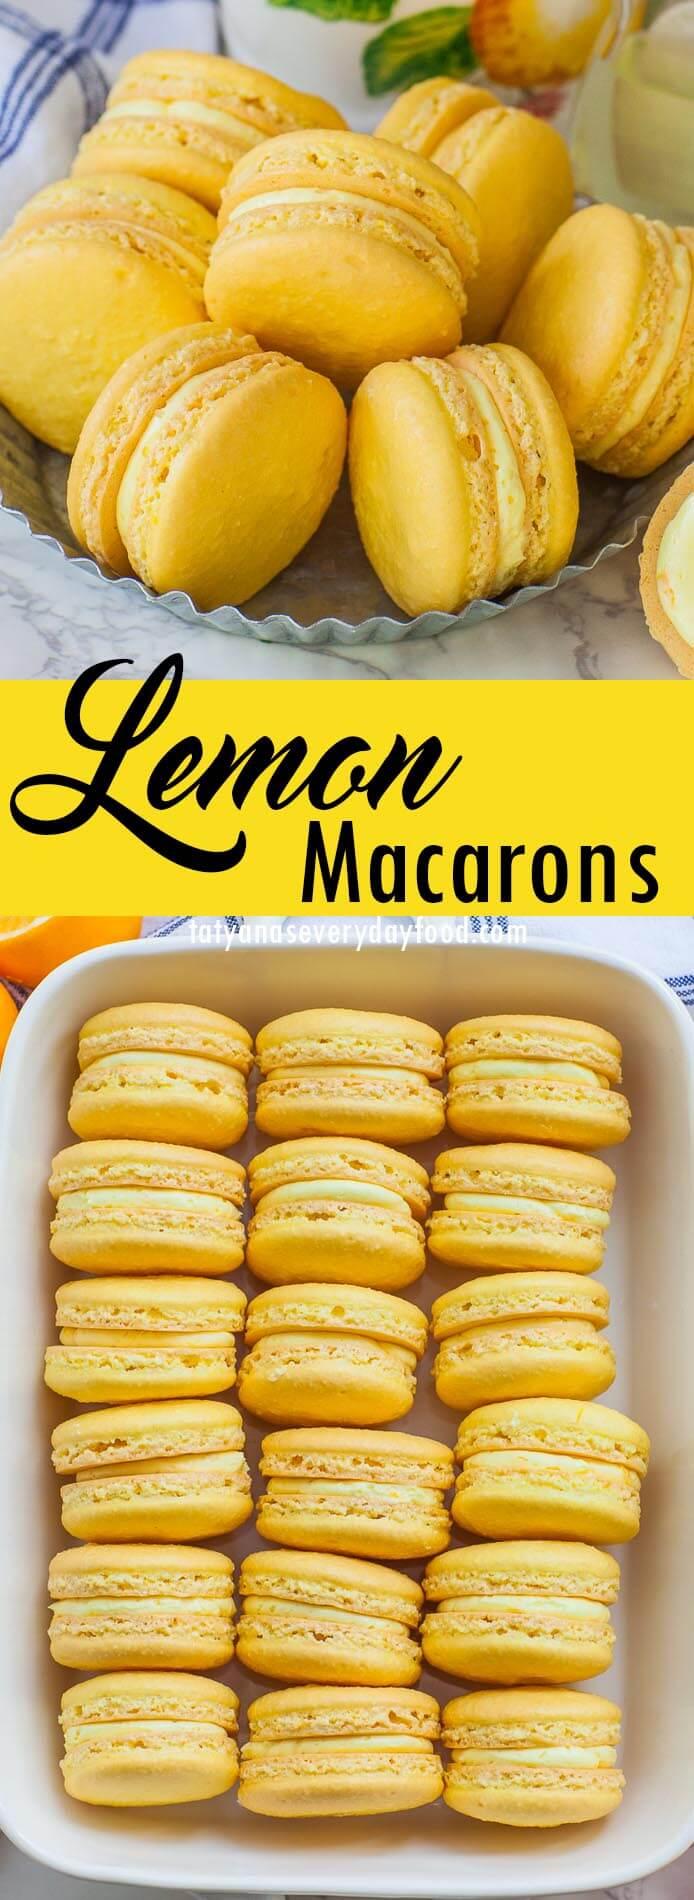 Triple Lemon Macarons video recipe